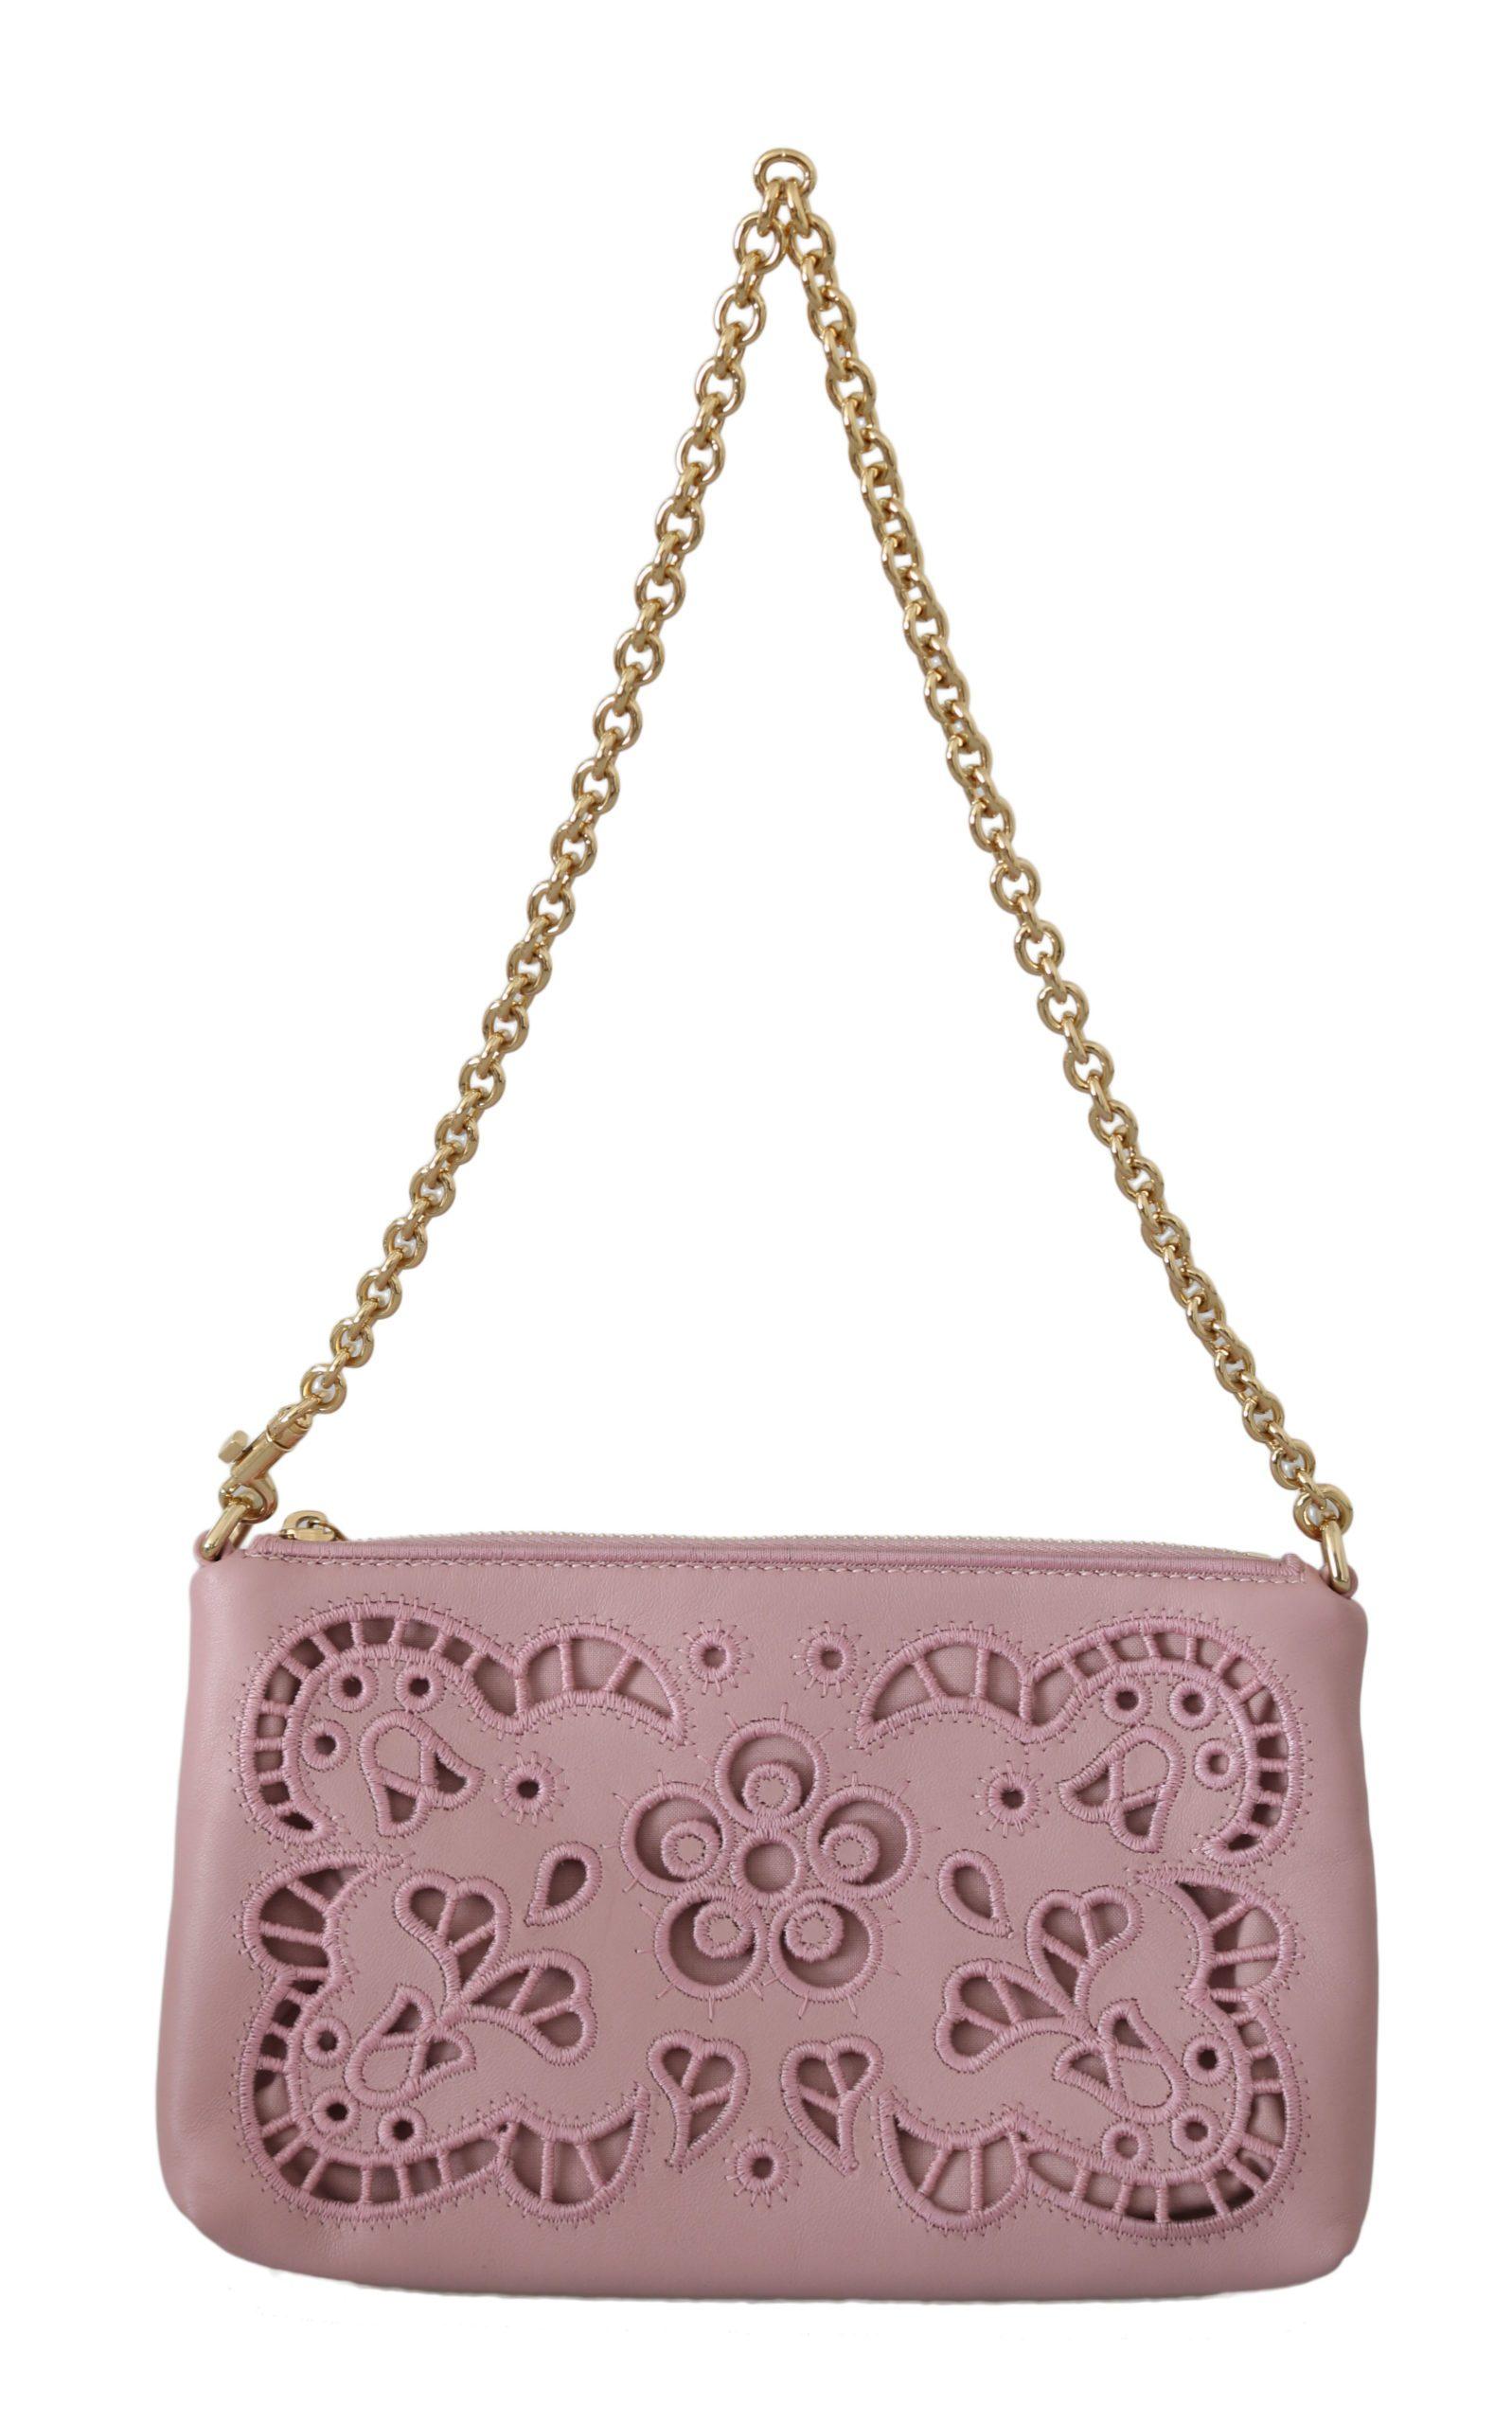 Dolce & Gabbana Women's Cutout Mini Leather Crossbody Bag Pink VAS8634